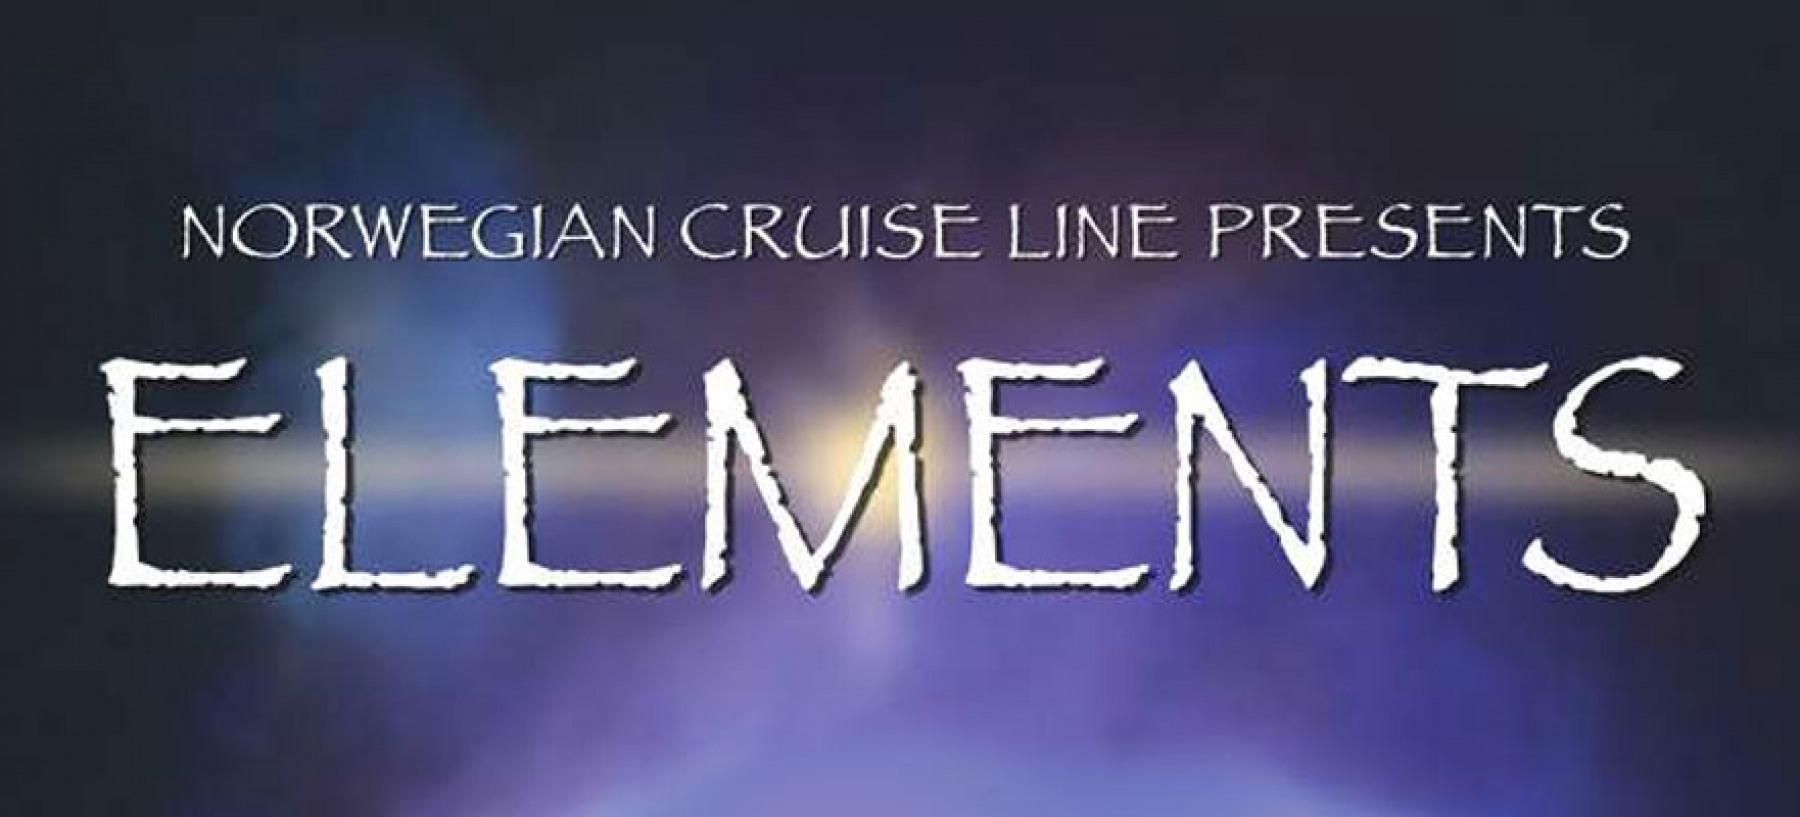 Norwegian Cruise Lines Norwegian Joy Interior Elements.jpg